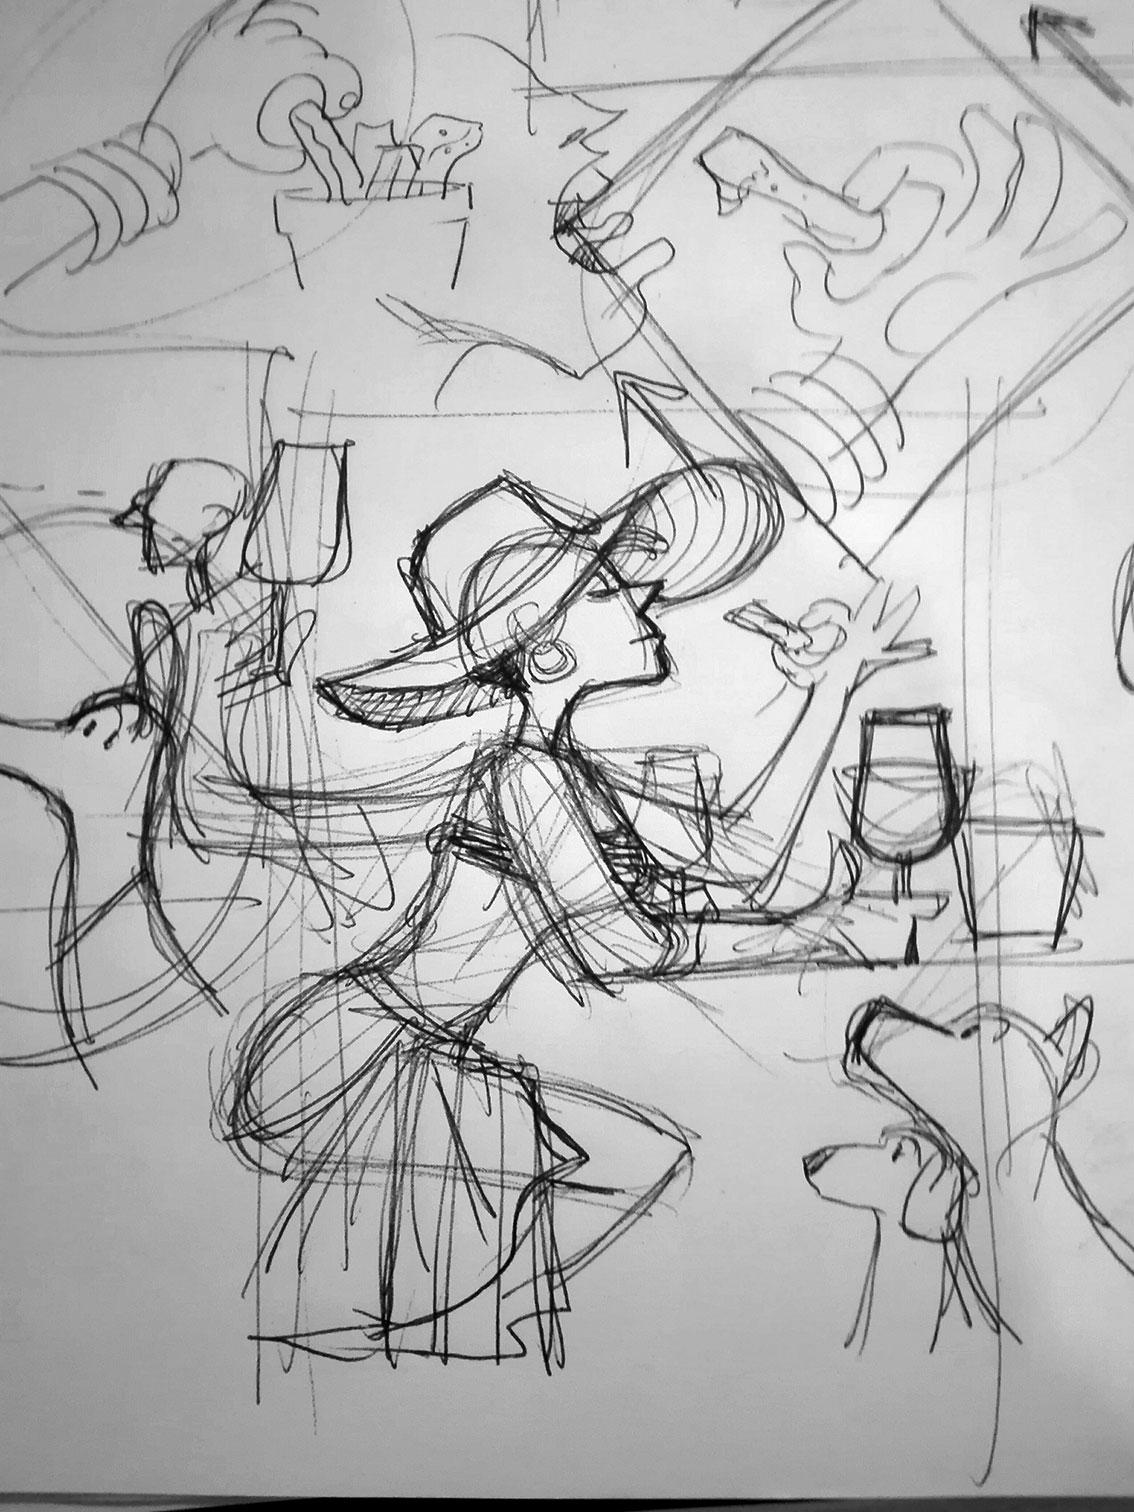 Sketches. Lisbon 2019.